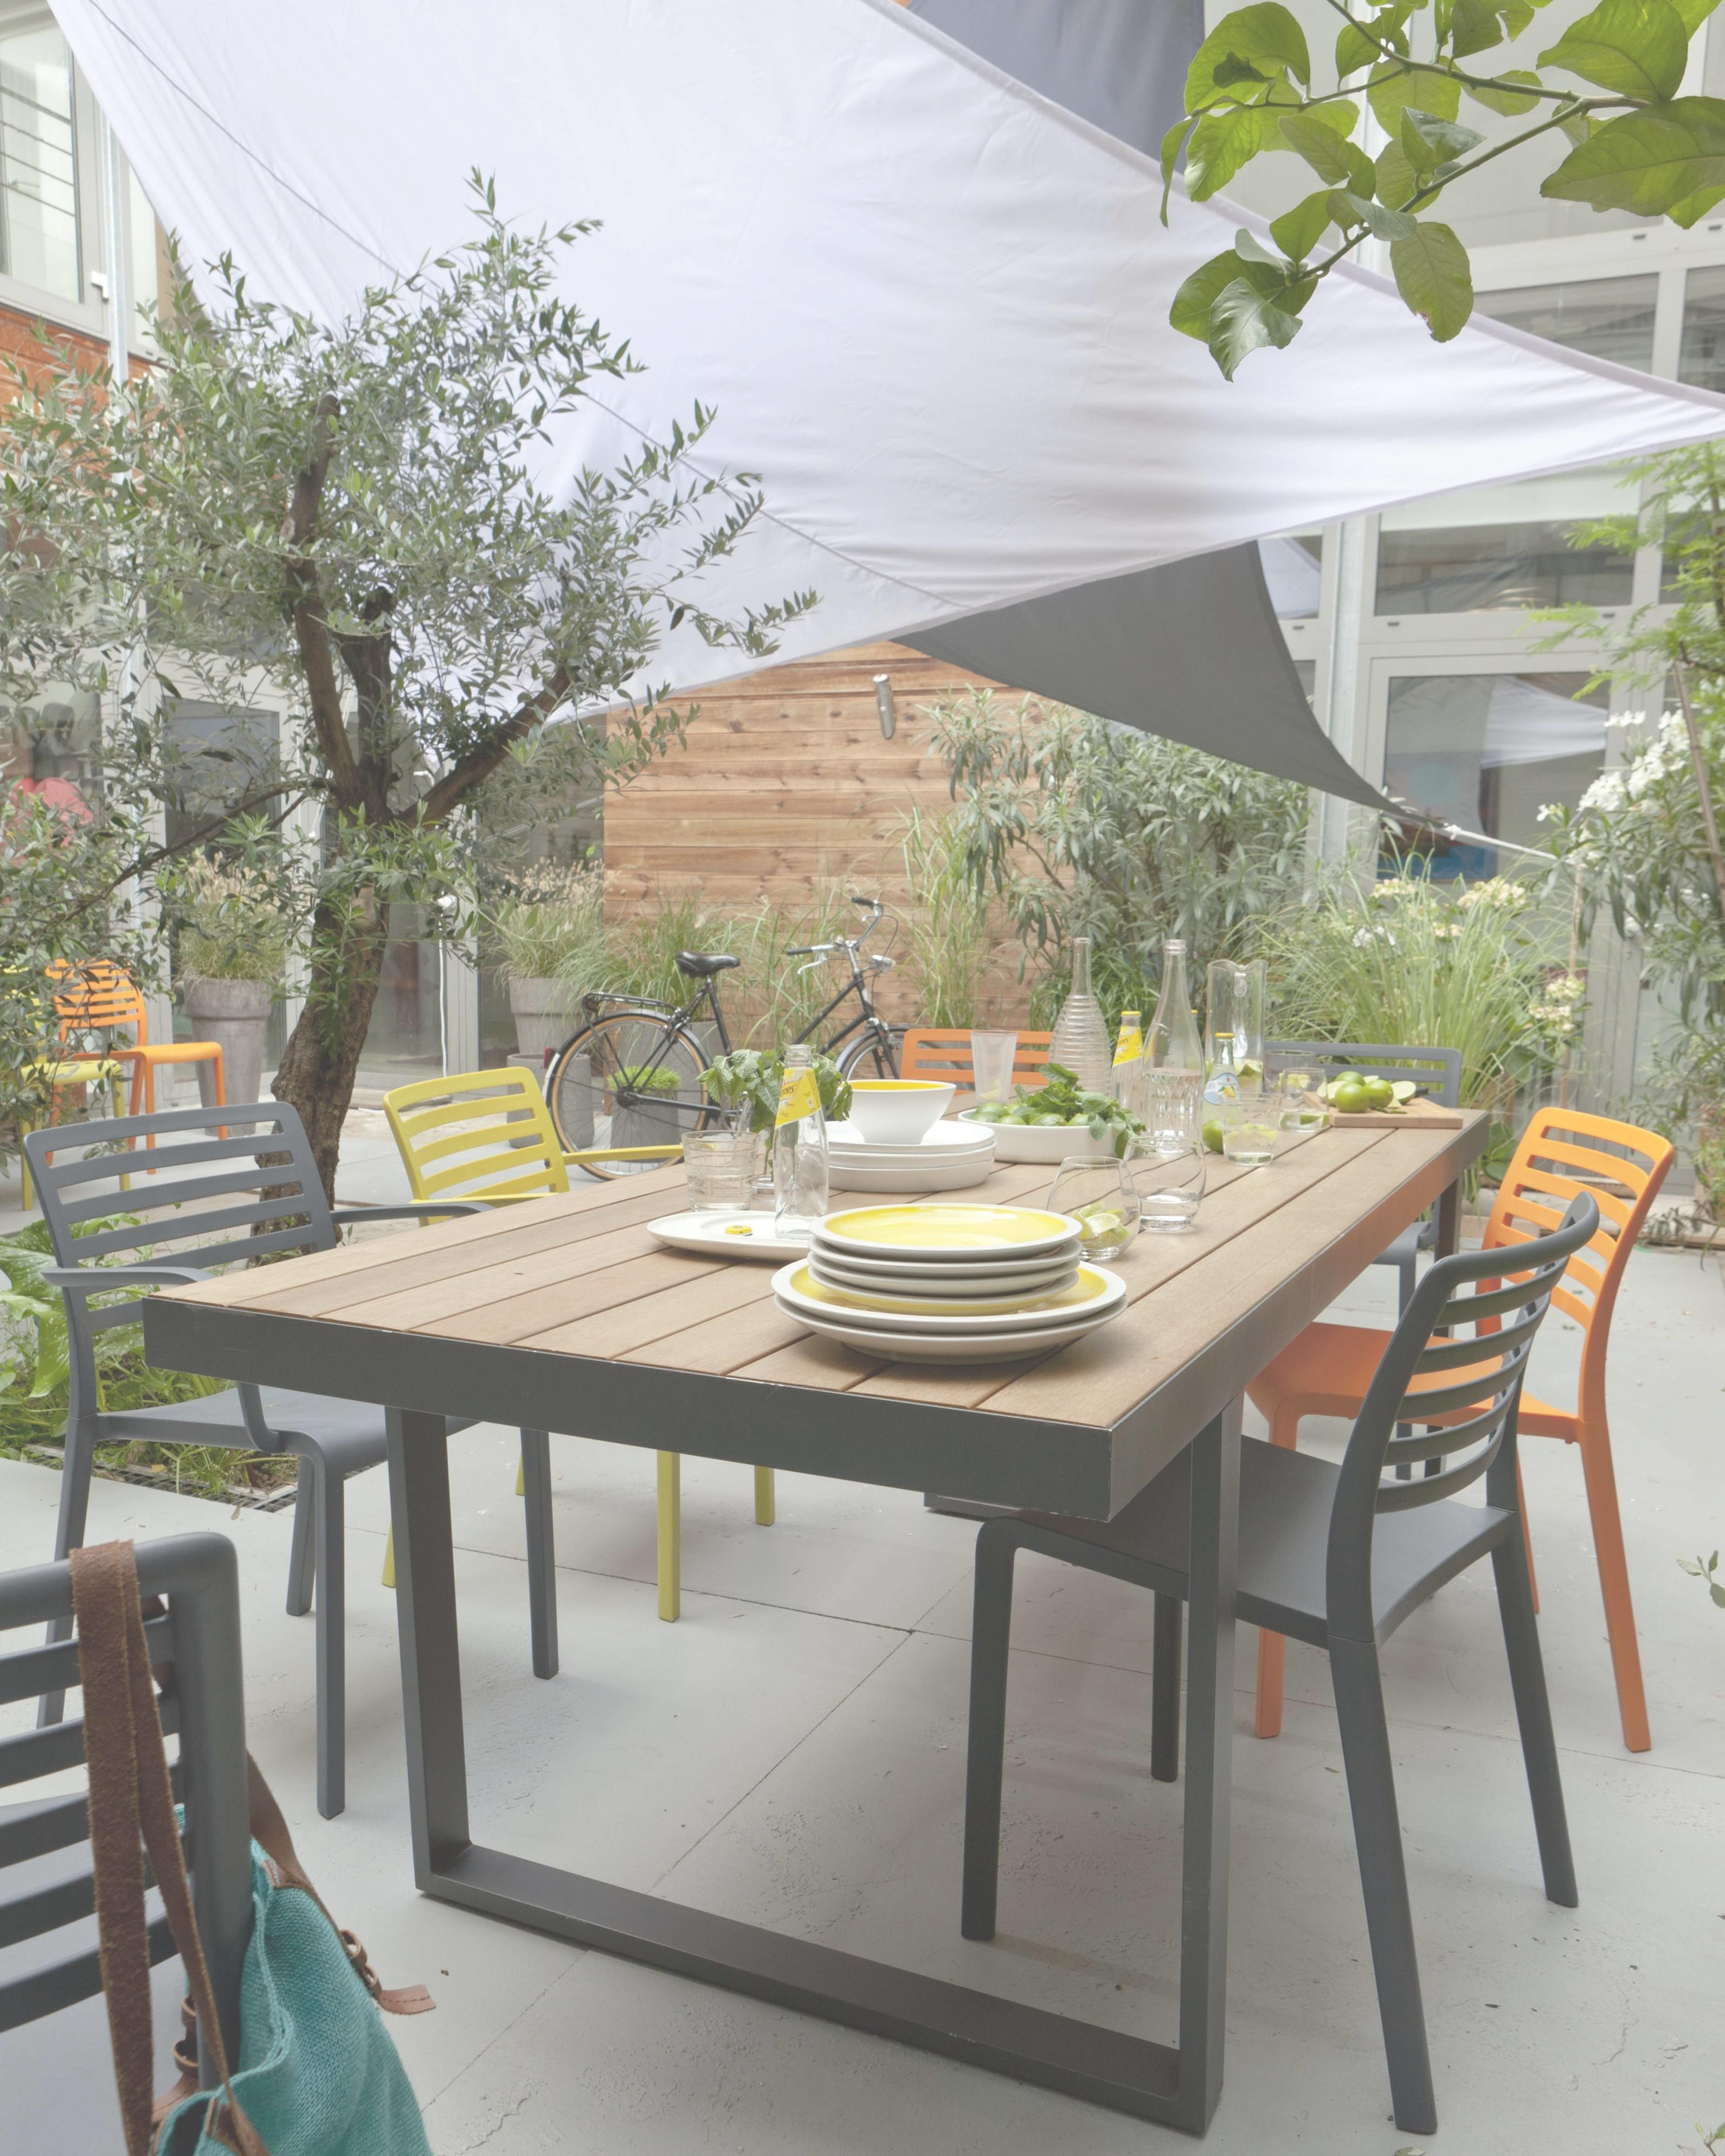 Salon De Jardin Fer forgé Le Bon Coin Frais Galerie Meilleur Table Jardin Castorama